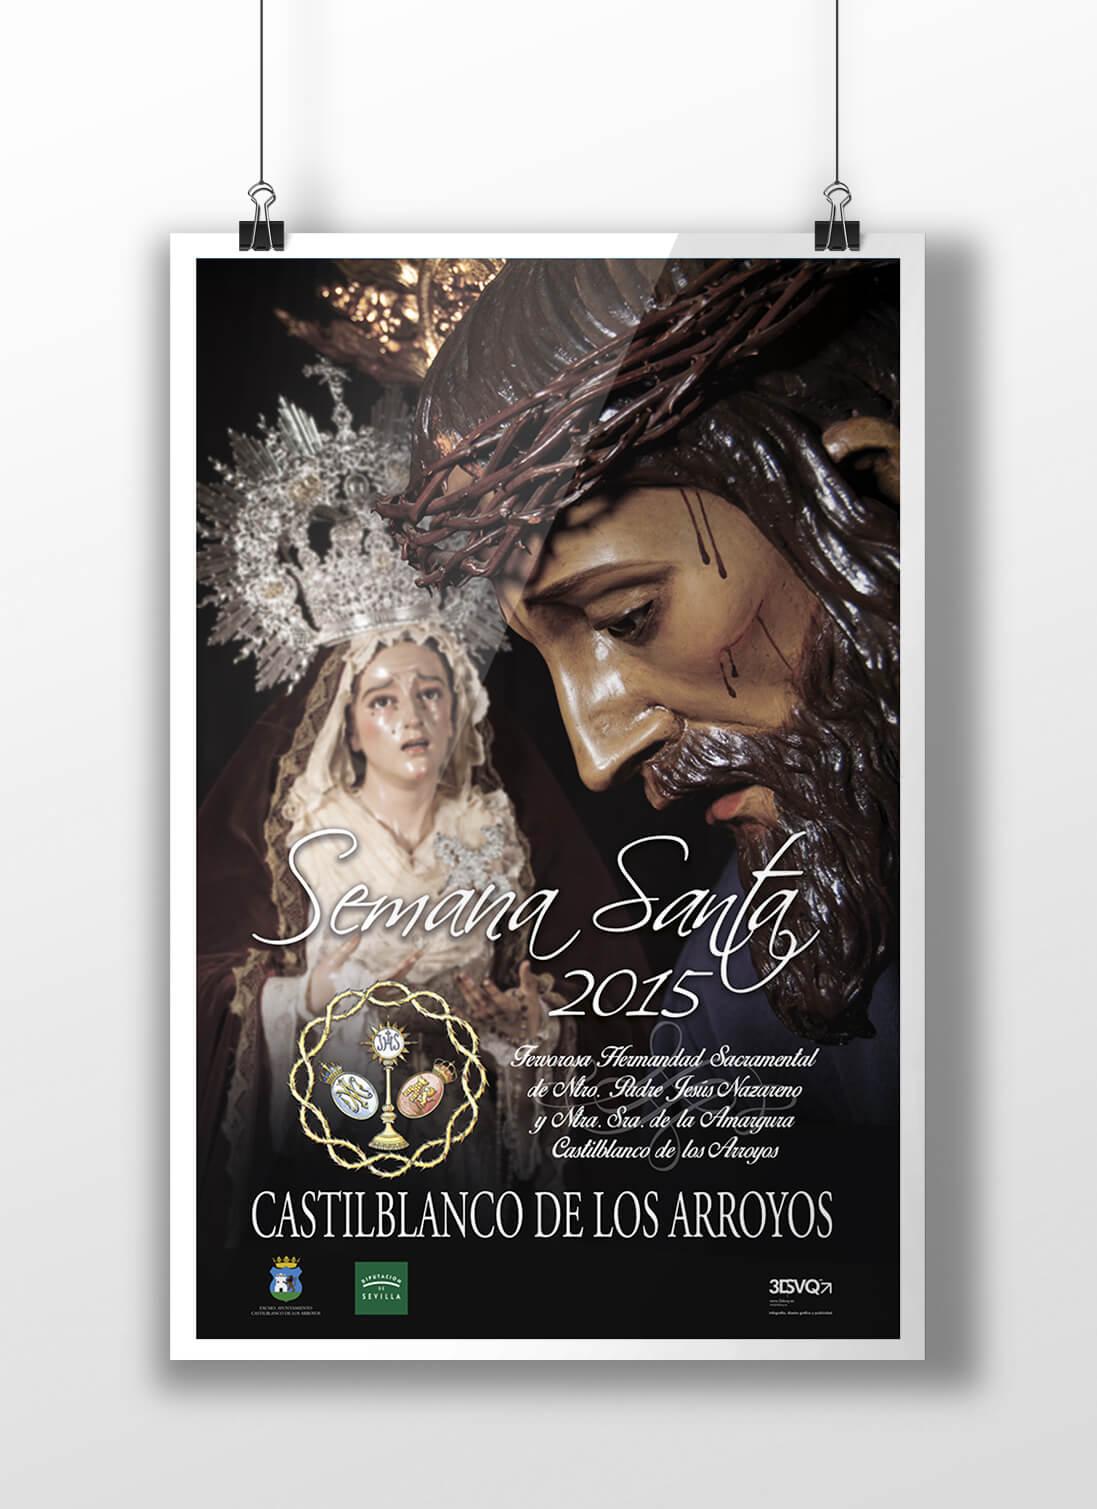 Cartel Semana Santa Castilblanco Arroyos 2015